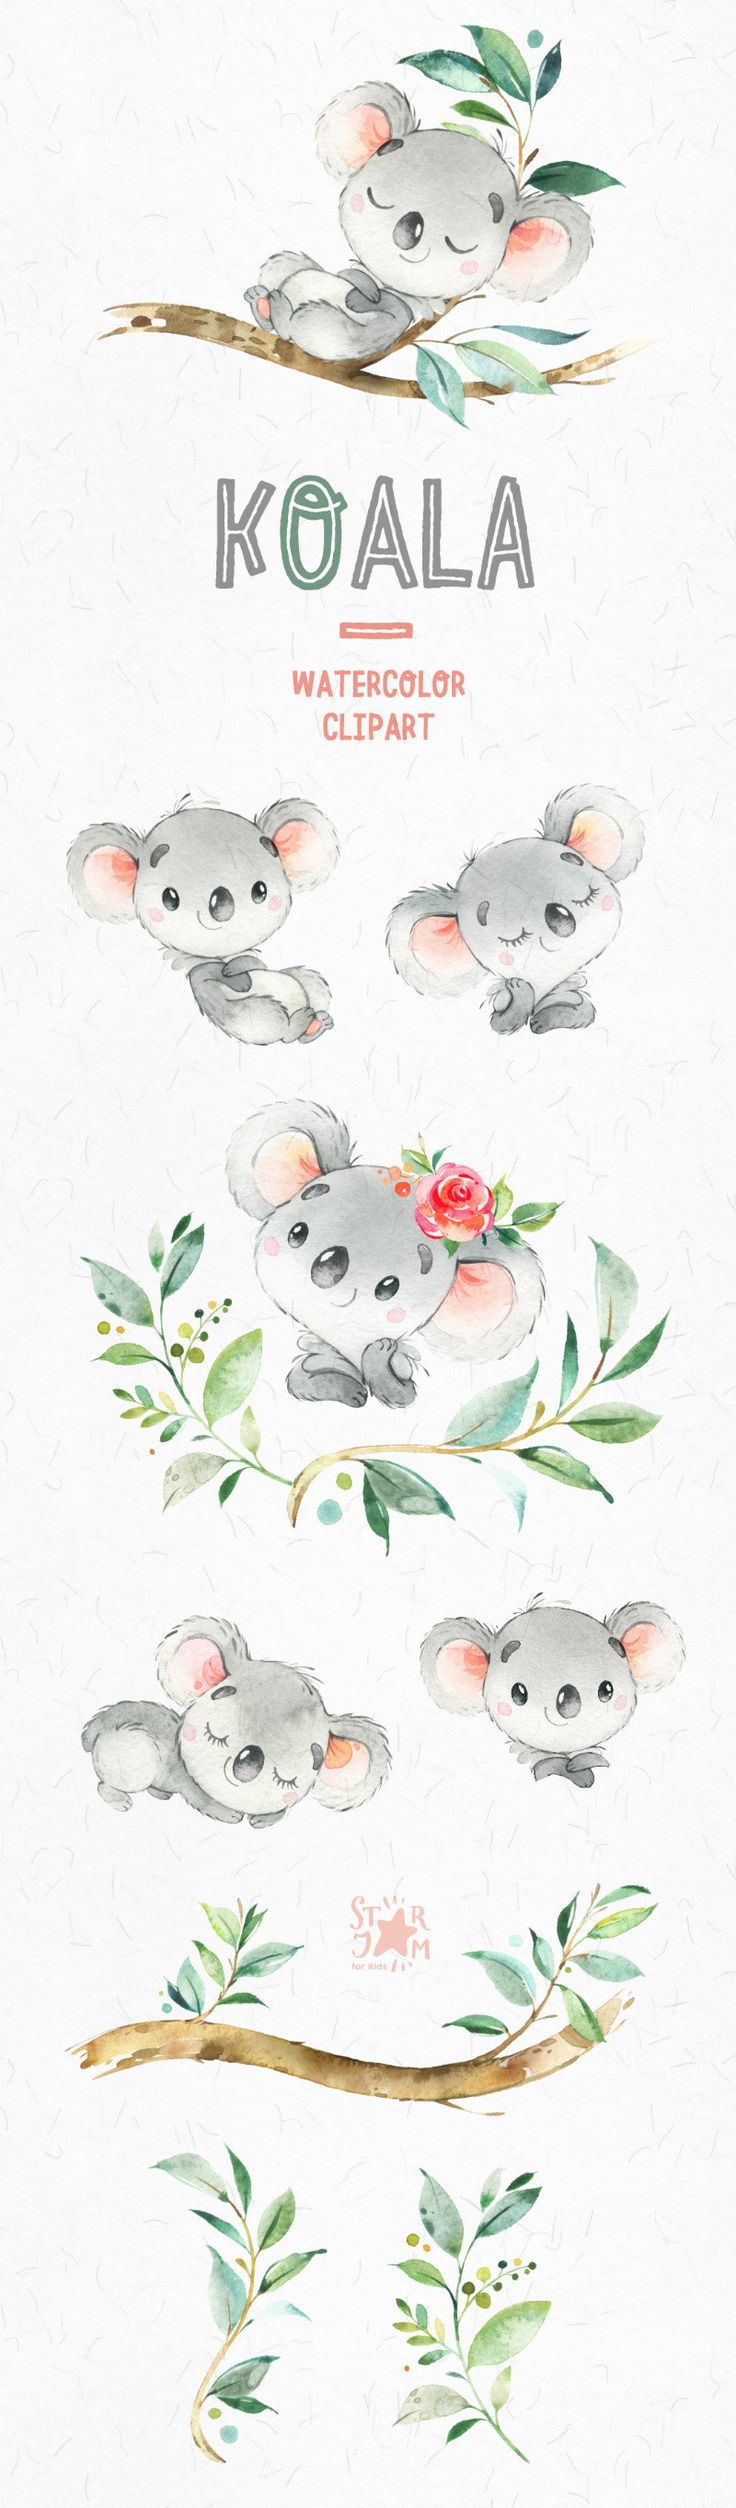 Little animals watercolor clipart Australia koala - use with the native animal material! Animals Watercolor, Watercolor Clipart, Watercolor Art, Watercolor Flowers, Koala Baby, Animal Set, Image Deco, Clip Art, Oeuvre D'art